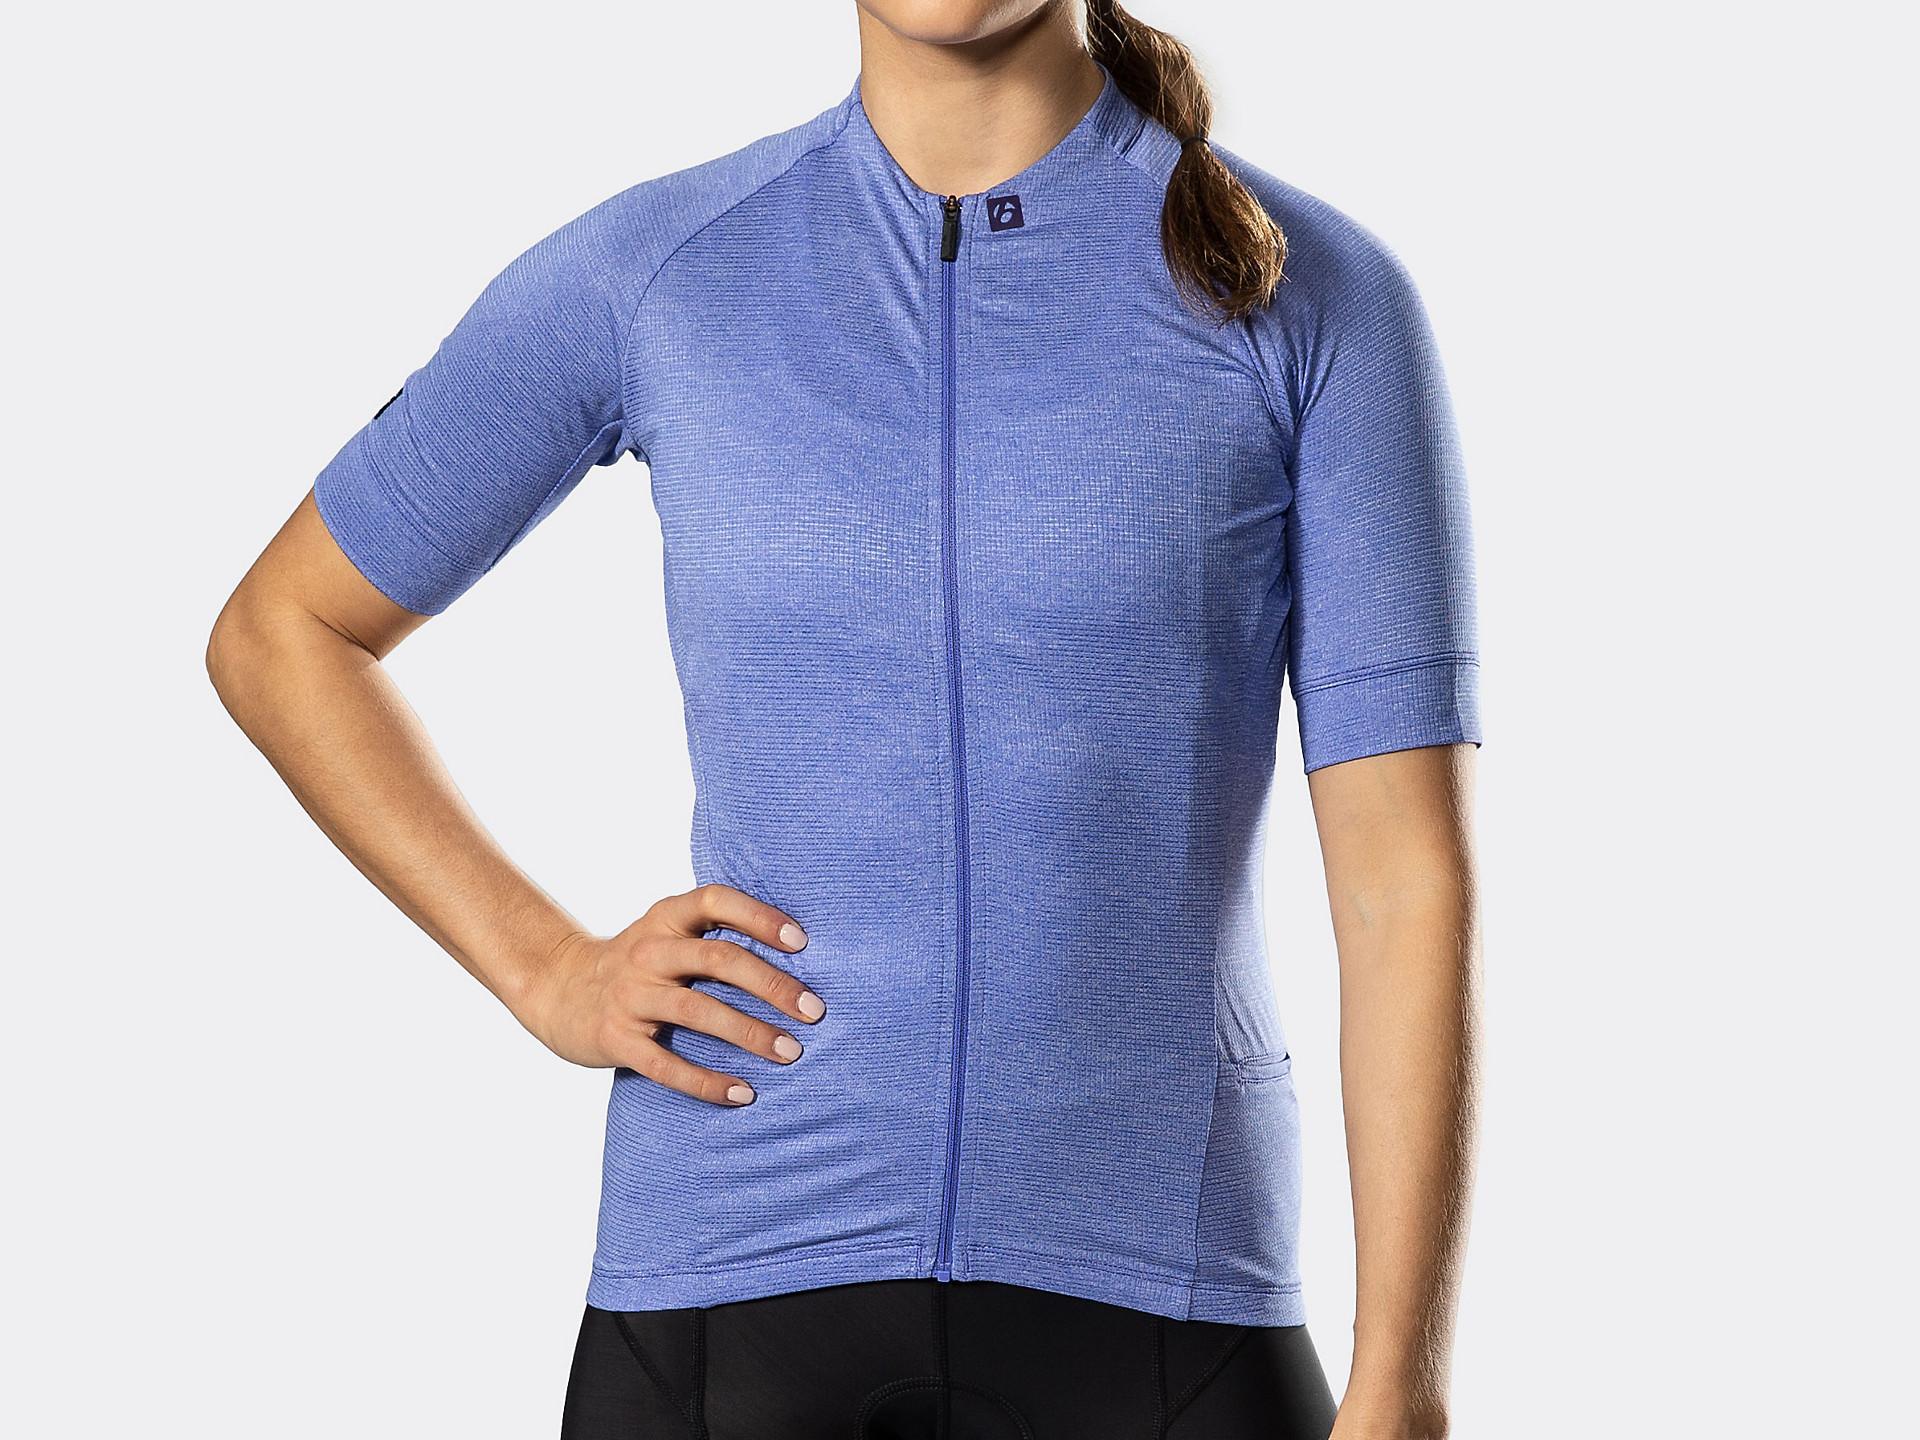 c2007078c Bontrager Anara Women s Cycling Jersey